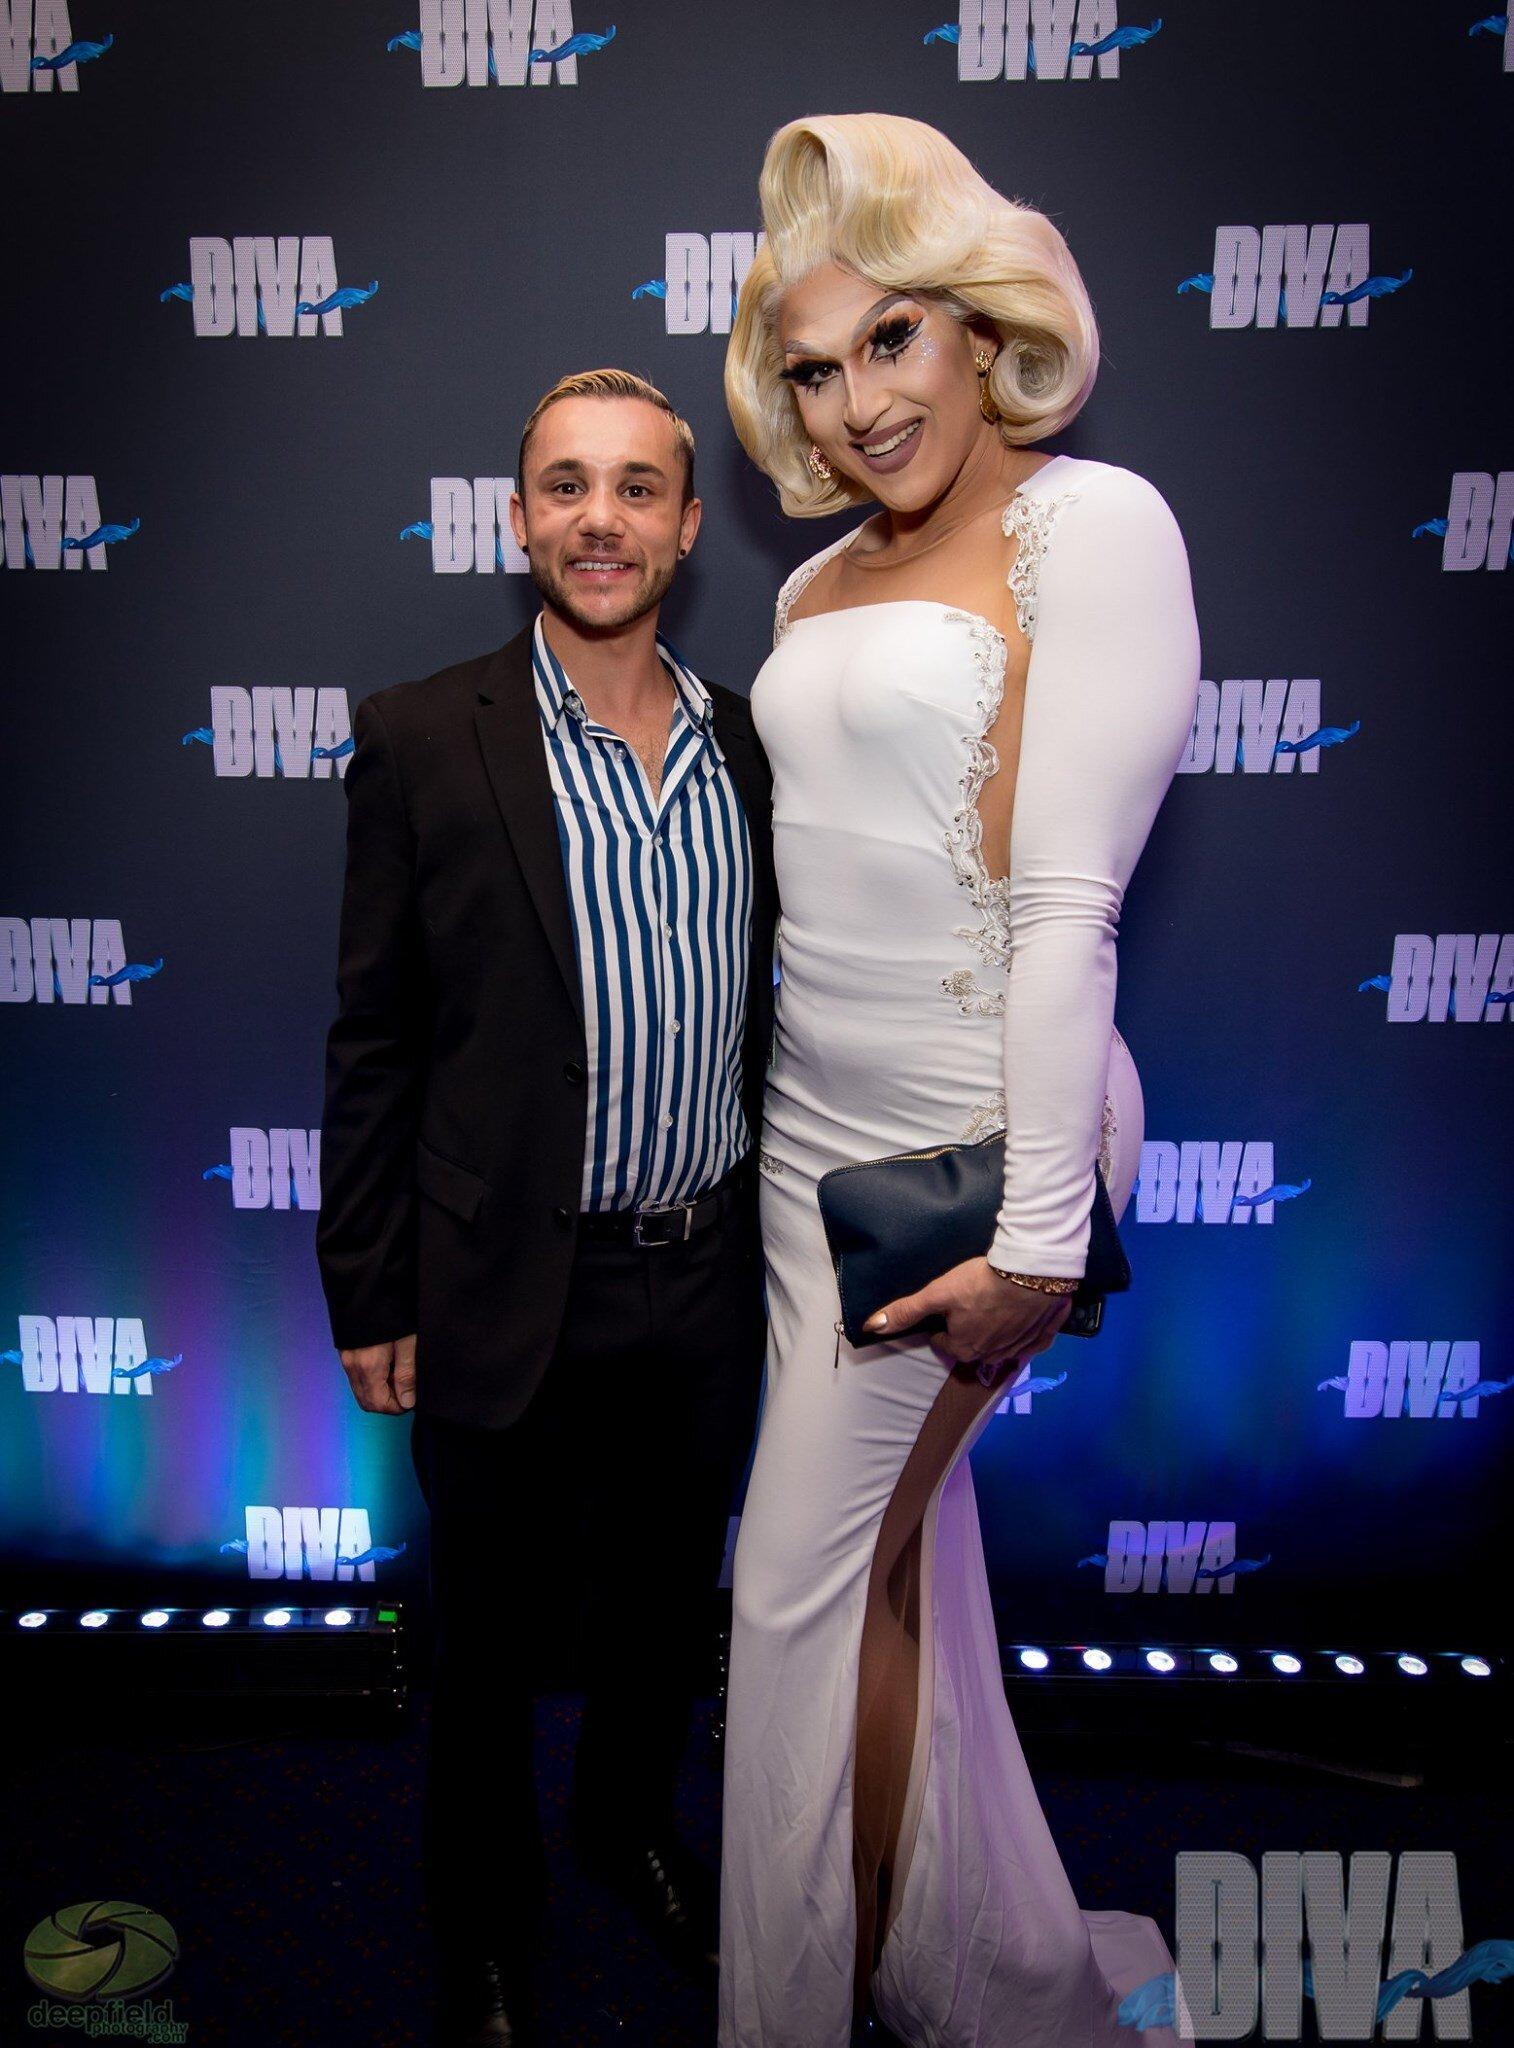 danni-issues-dj-dom-desouza-diva-awards-sydney-drag-queen-royalty-best-hire-drag-race-australia.jpg